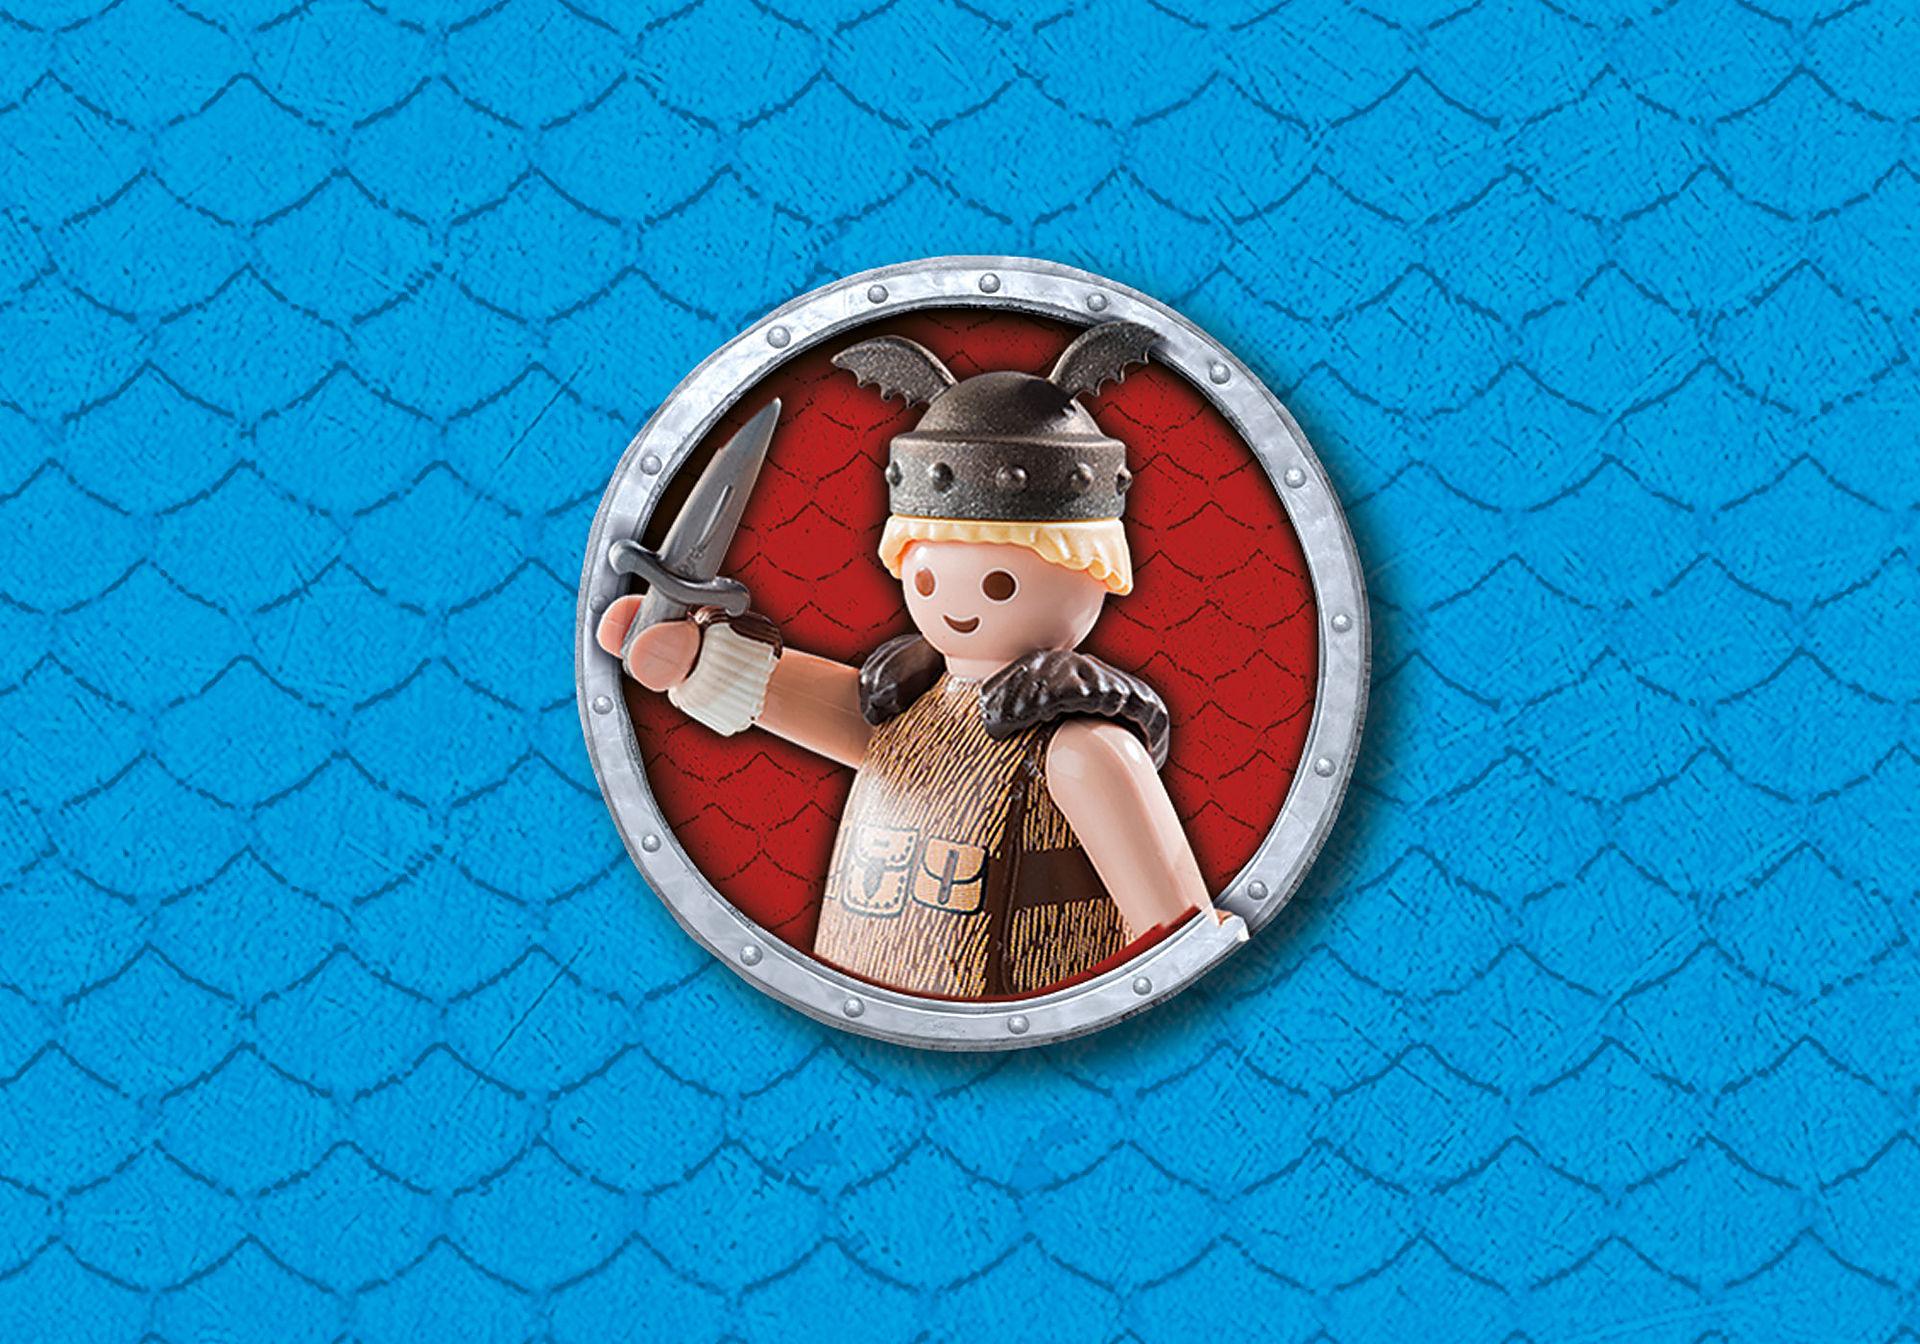 http://media.playmobil.com/i/playmobil/9460_product_extra3/Fischbein und Fleischklops